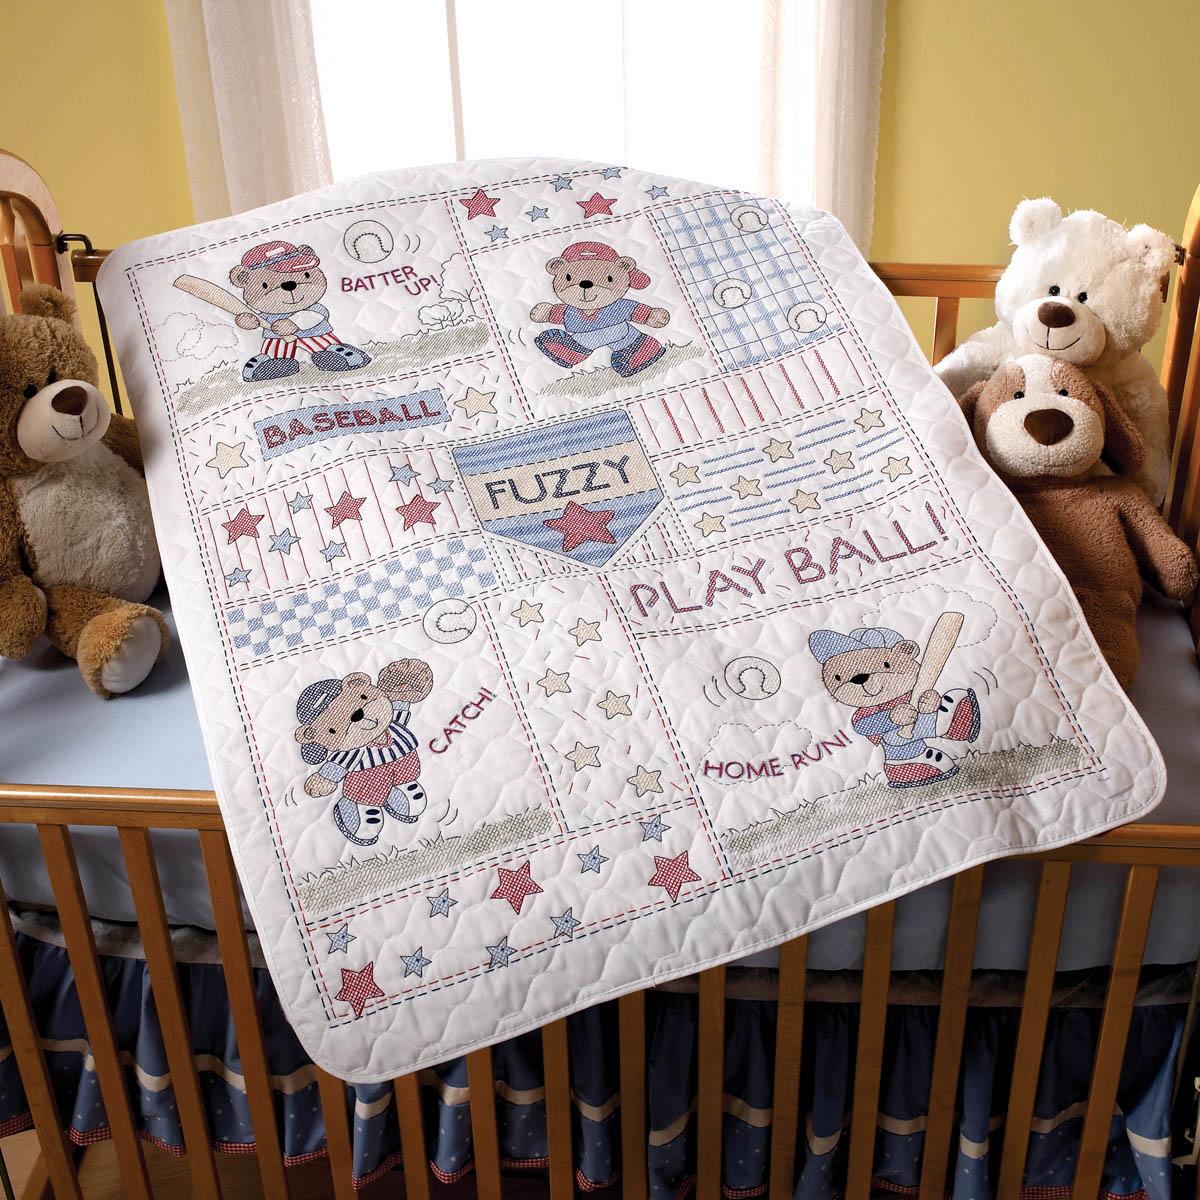 Bucilla ® Baby - Stamped Cross Stitch - Crib Ensembles - Baseball Buddies - Crib Cover